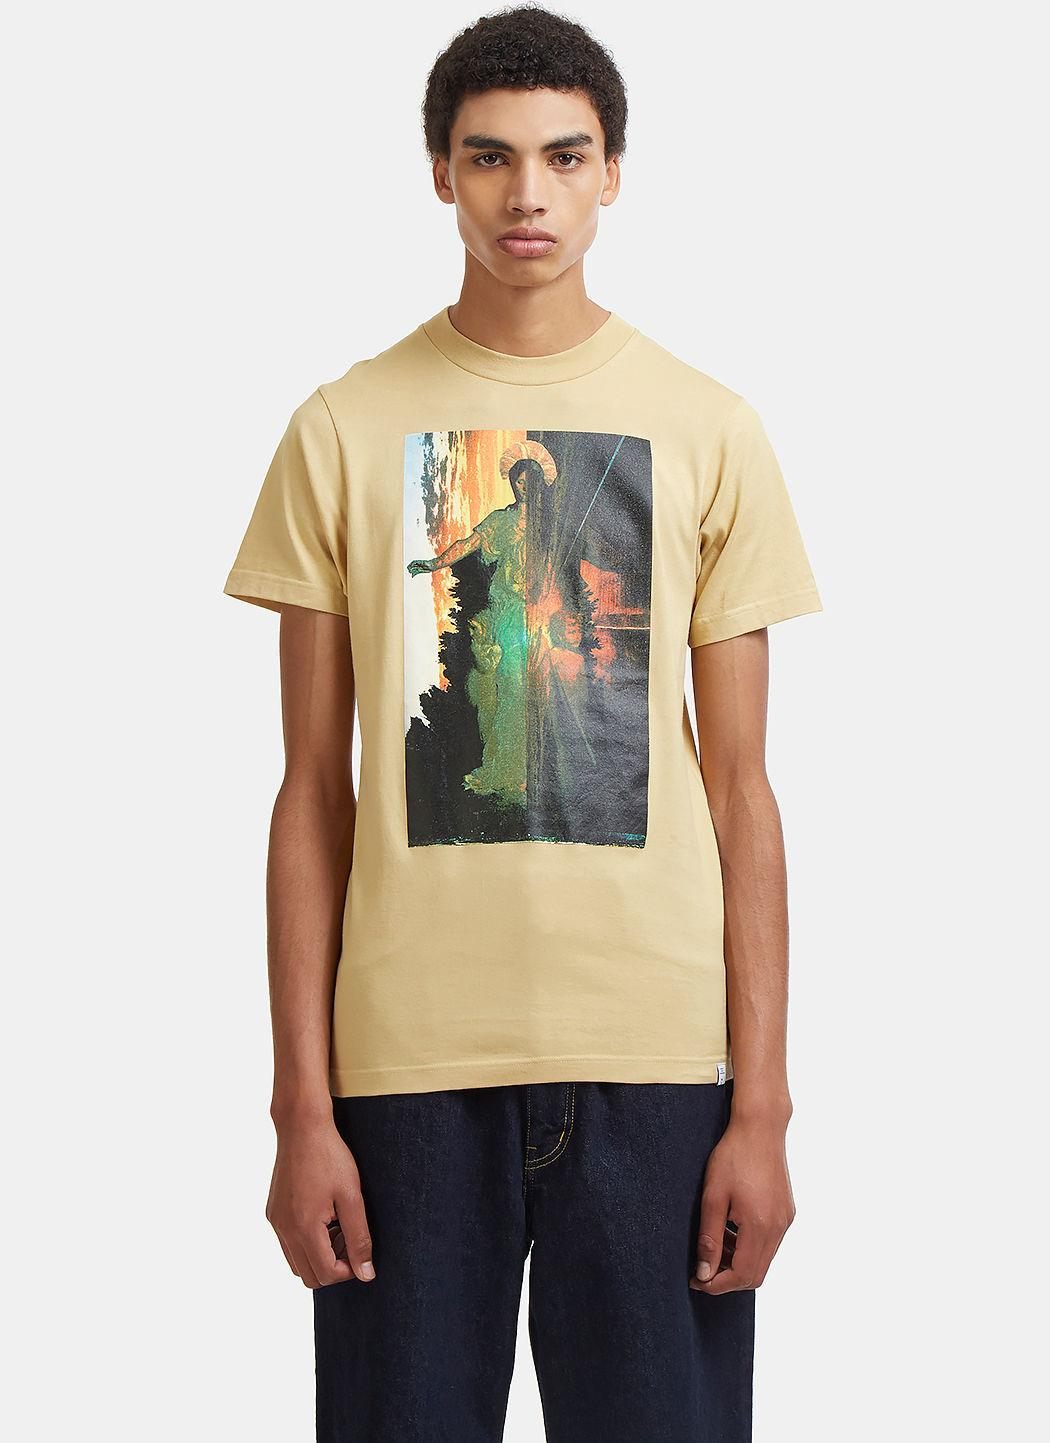 Facetasm Saint Mary Graphic Print T-Shirt In Beige